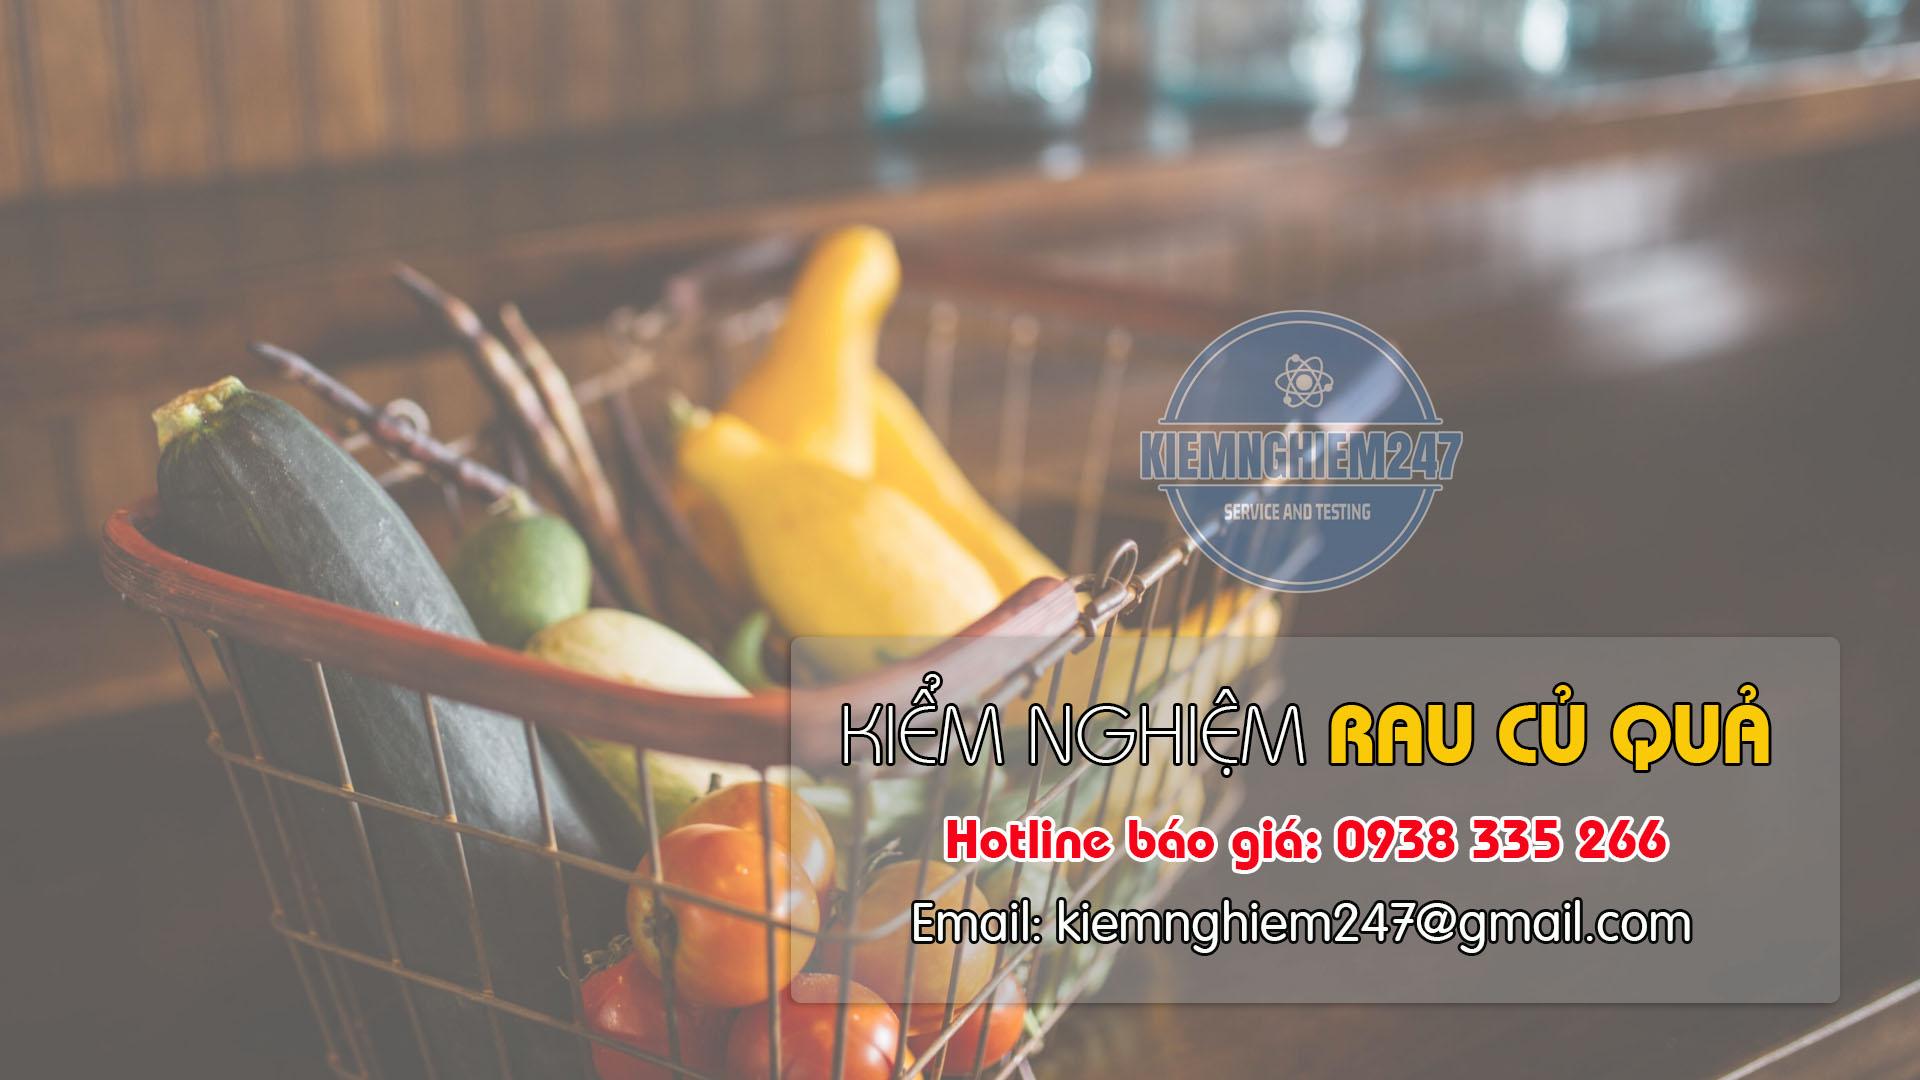 Kiểm nghiệm thực phẩm rau củ quả